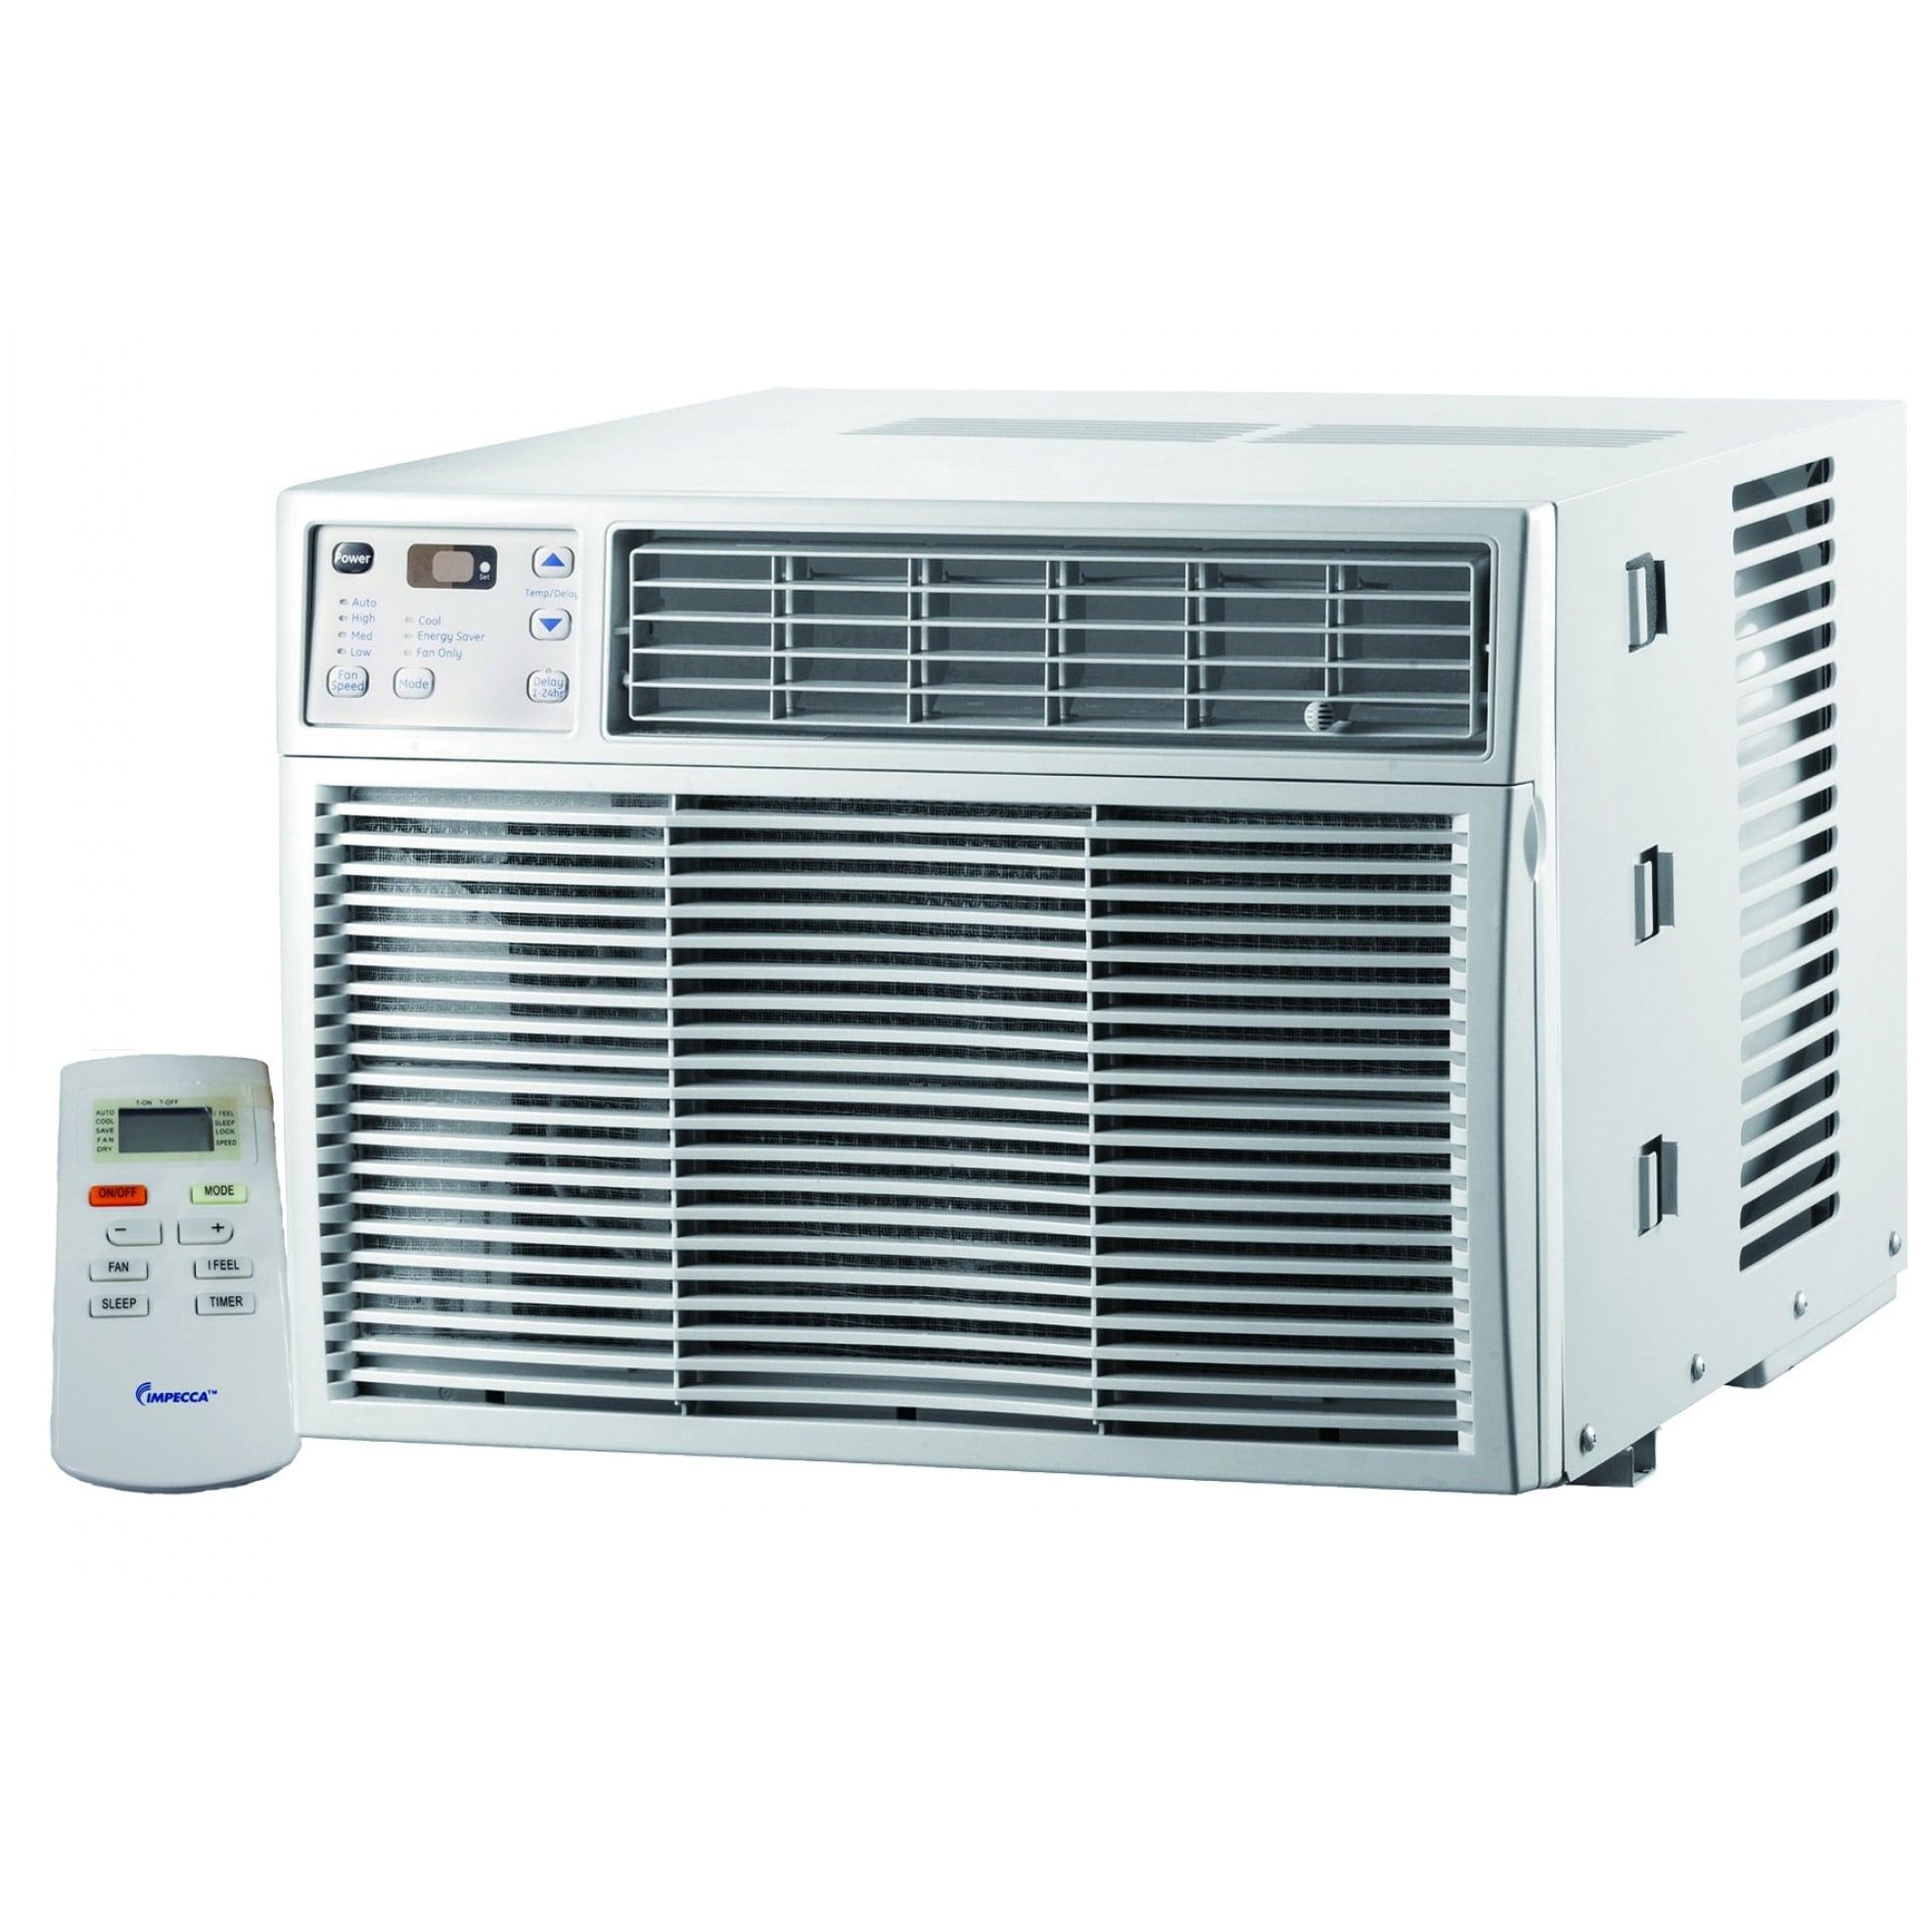 Impecca IWA-06CP 6,100 BTU Electronic Mini Window Air Conditioner - White